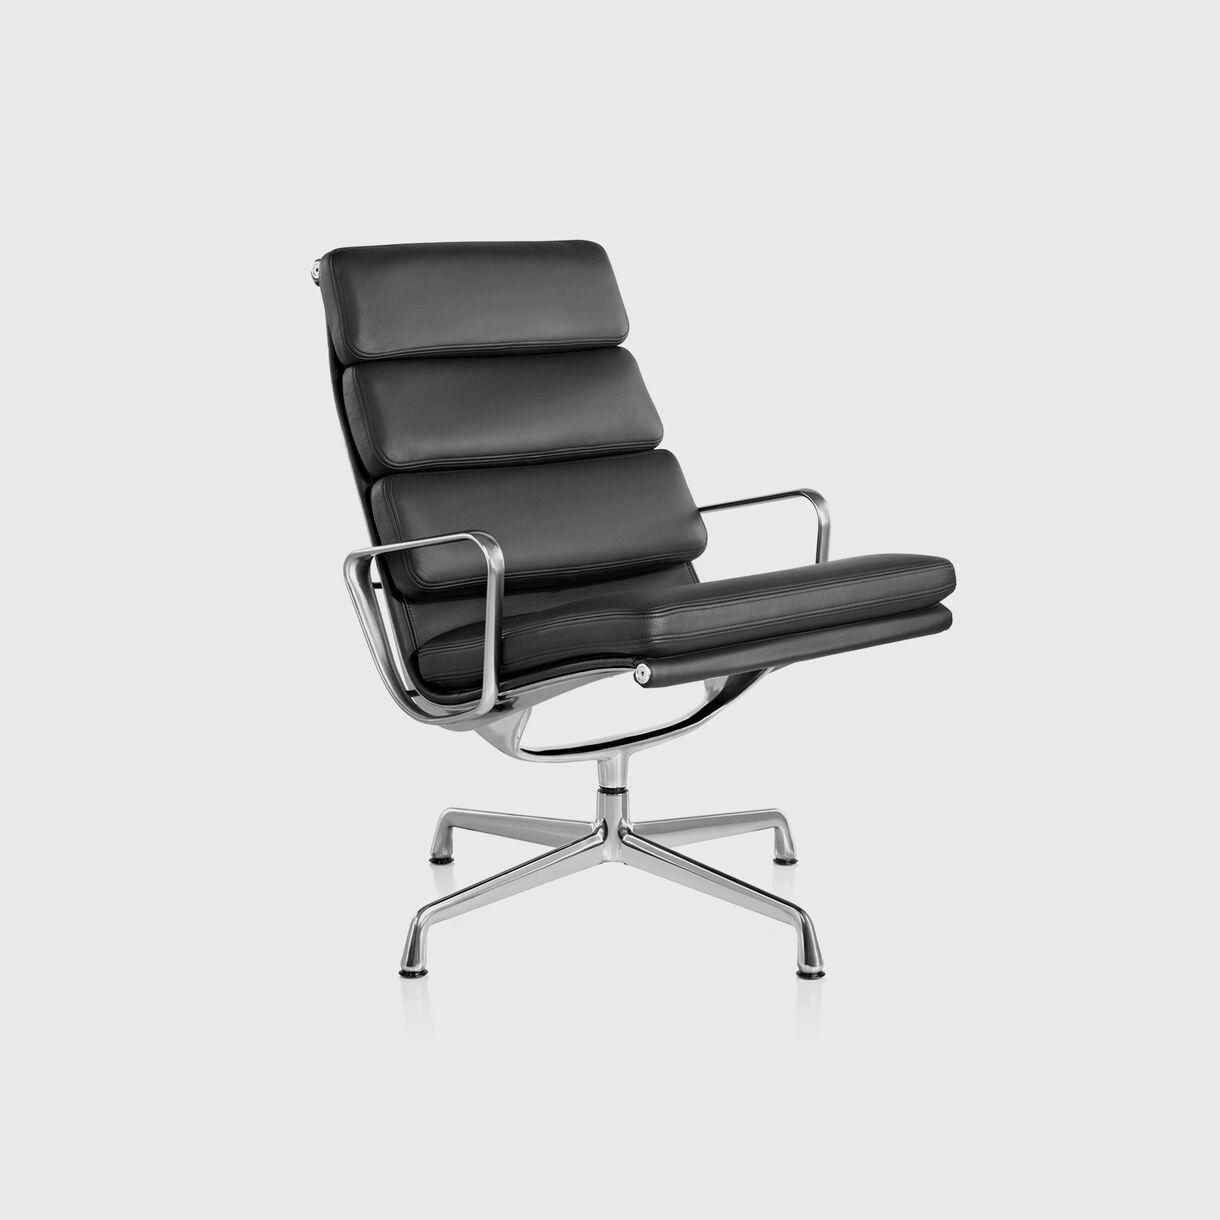 Eames Soft Pad Lounge Chair, 3 Cushions, Black Leather & Polished Aluminium